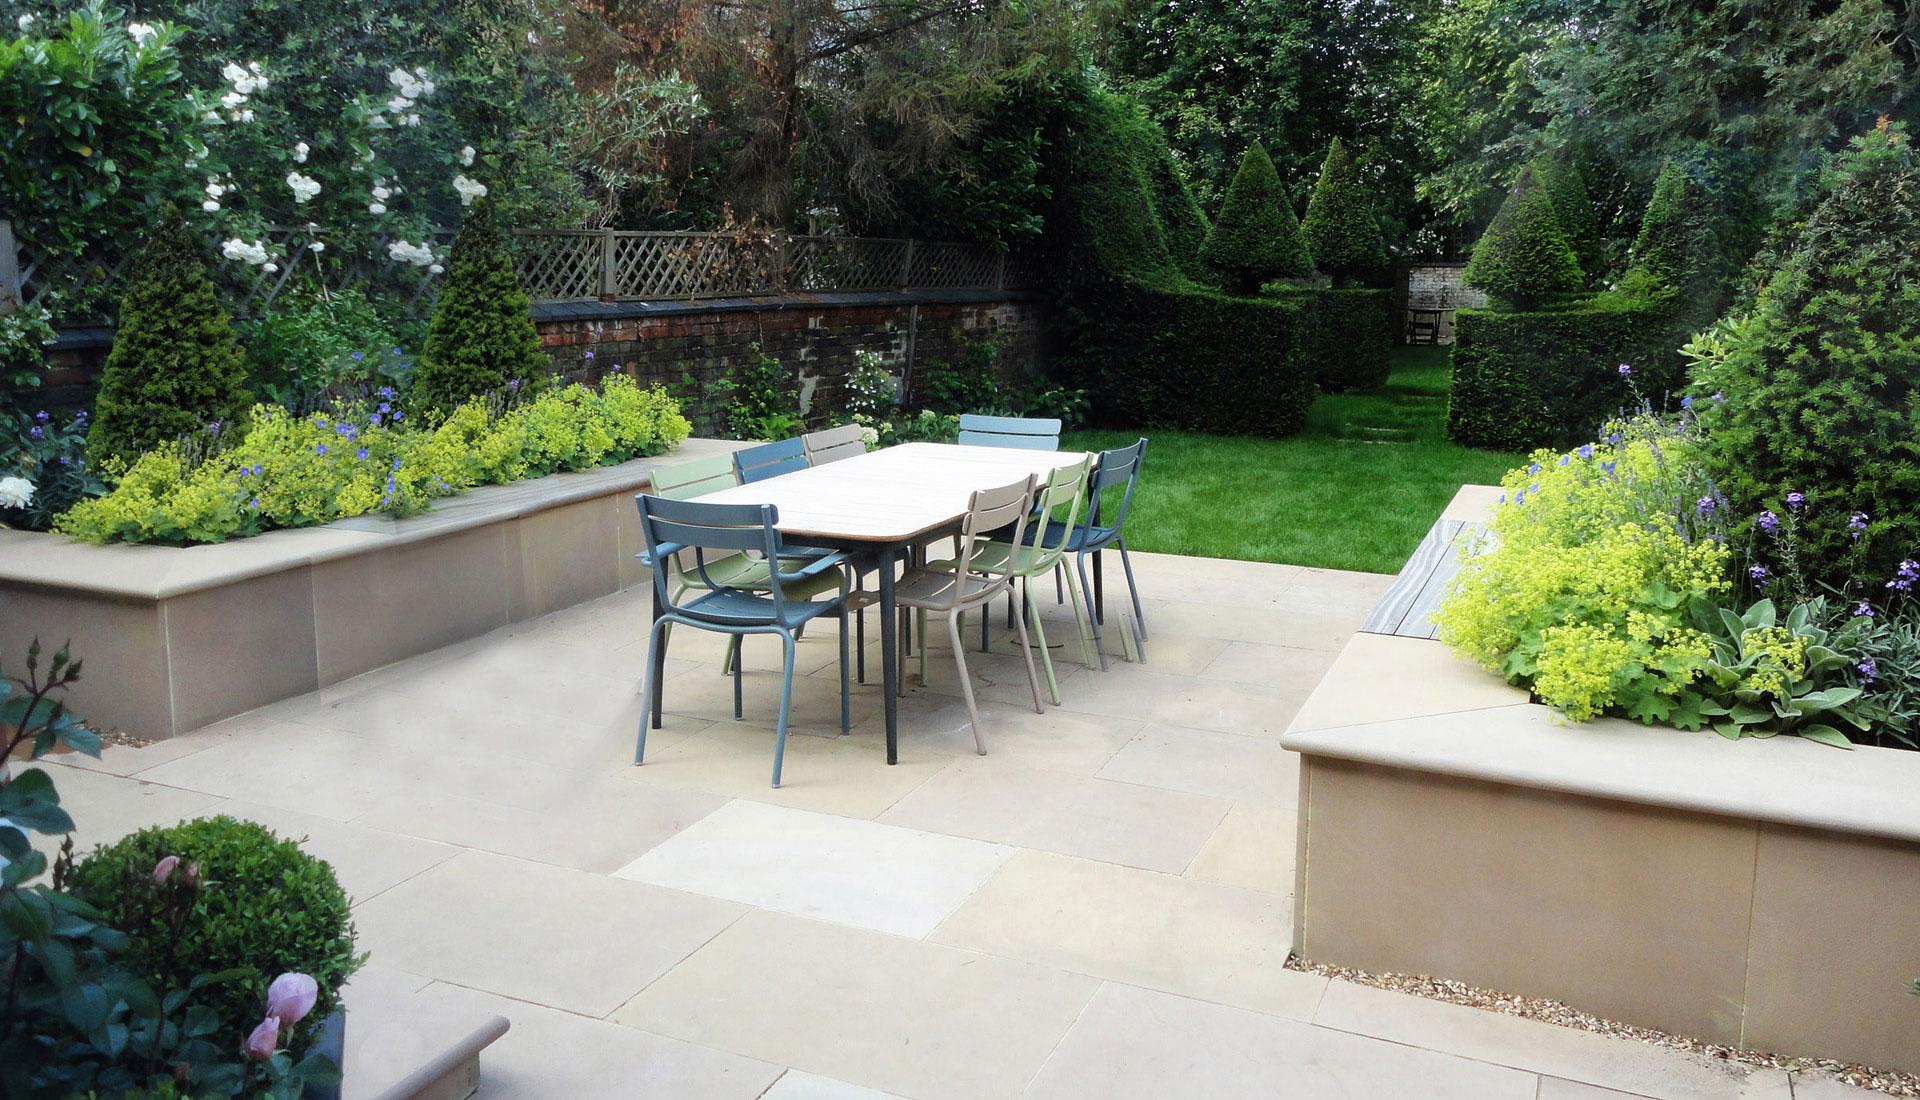 Topiary Garden Garden Design By Antonia Schofield